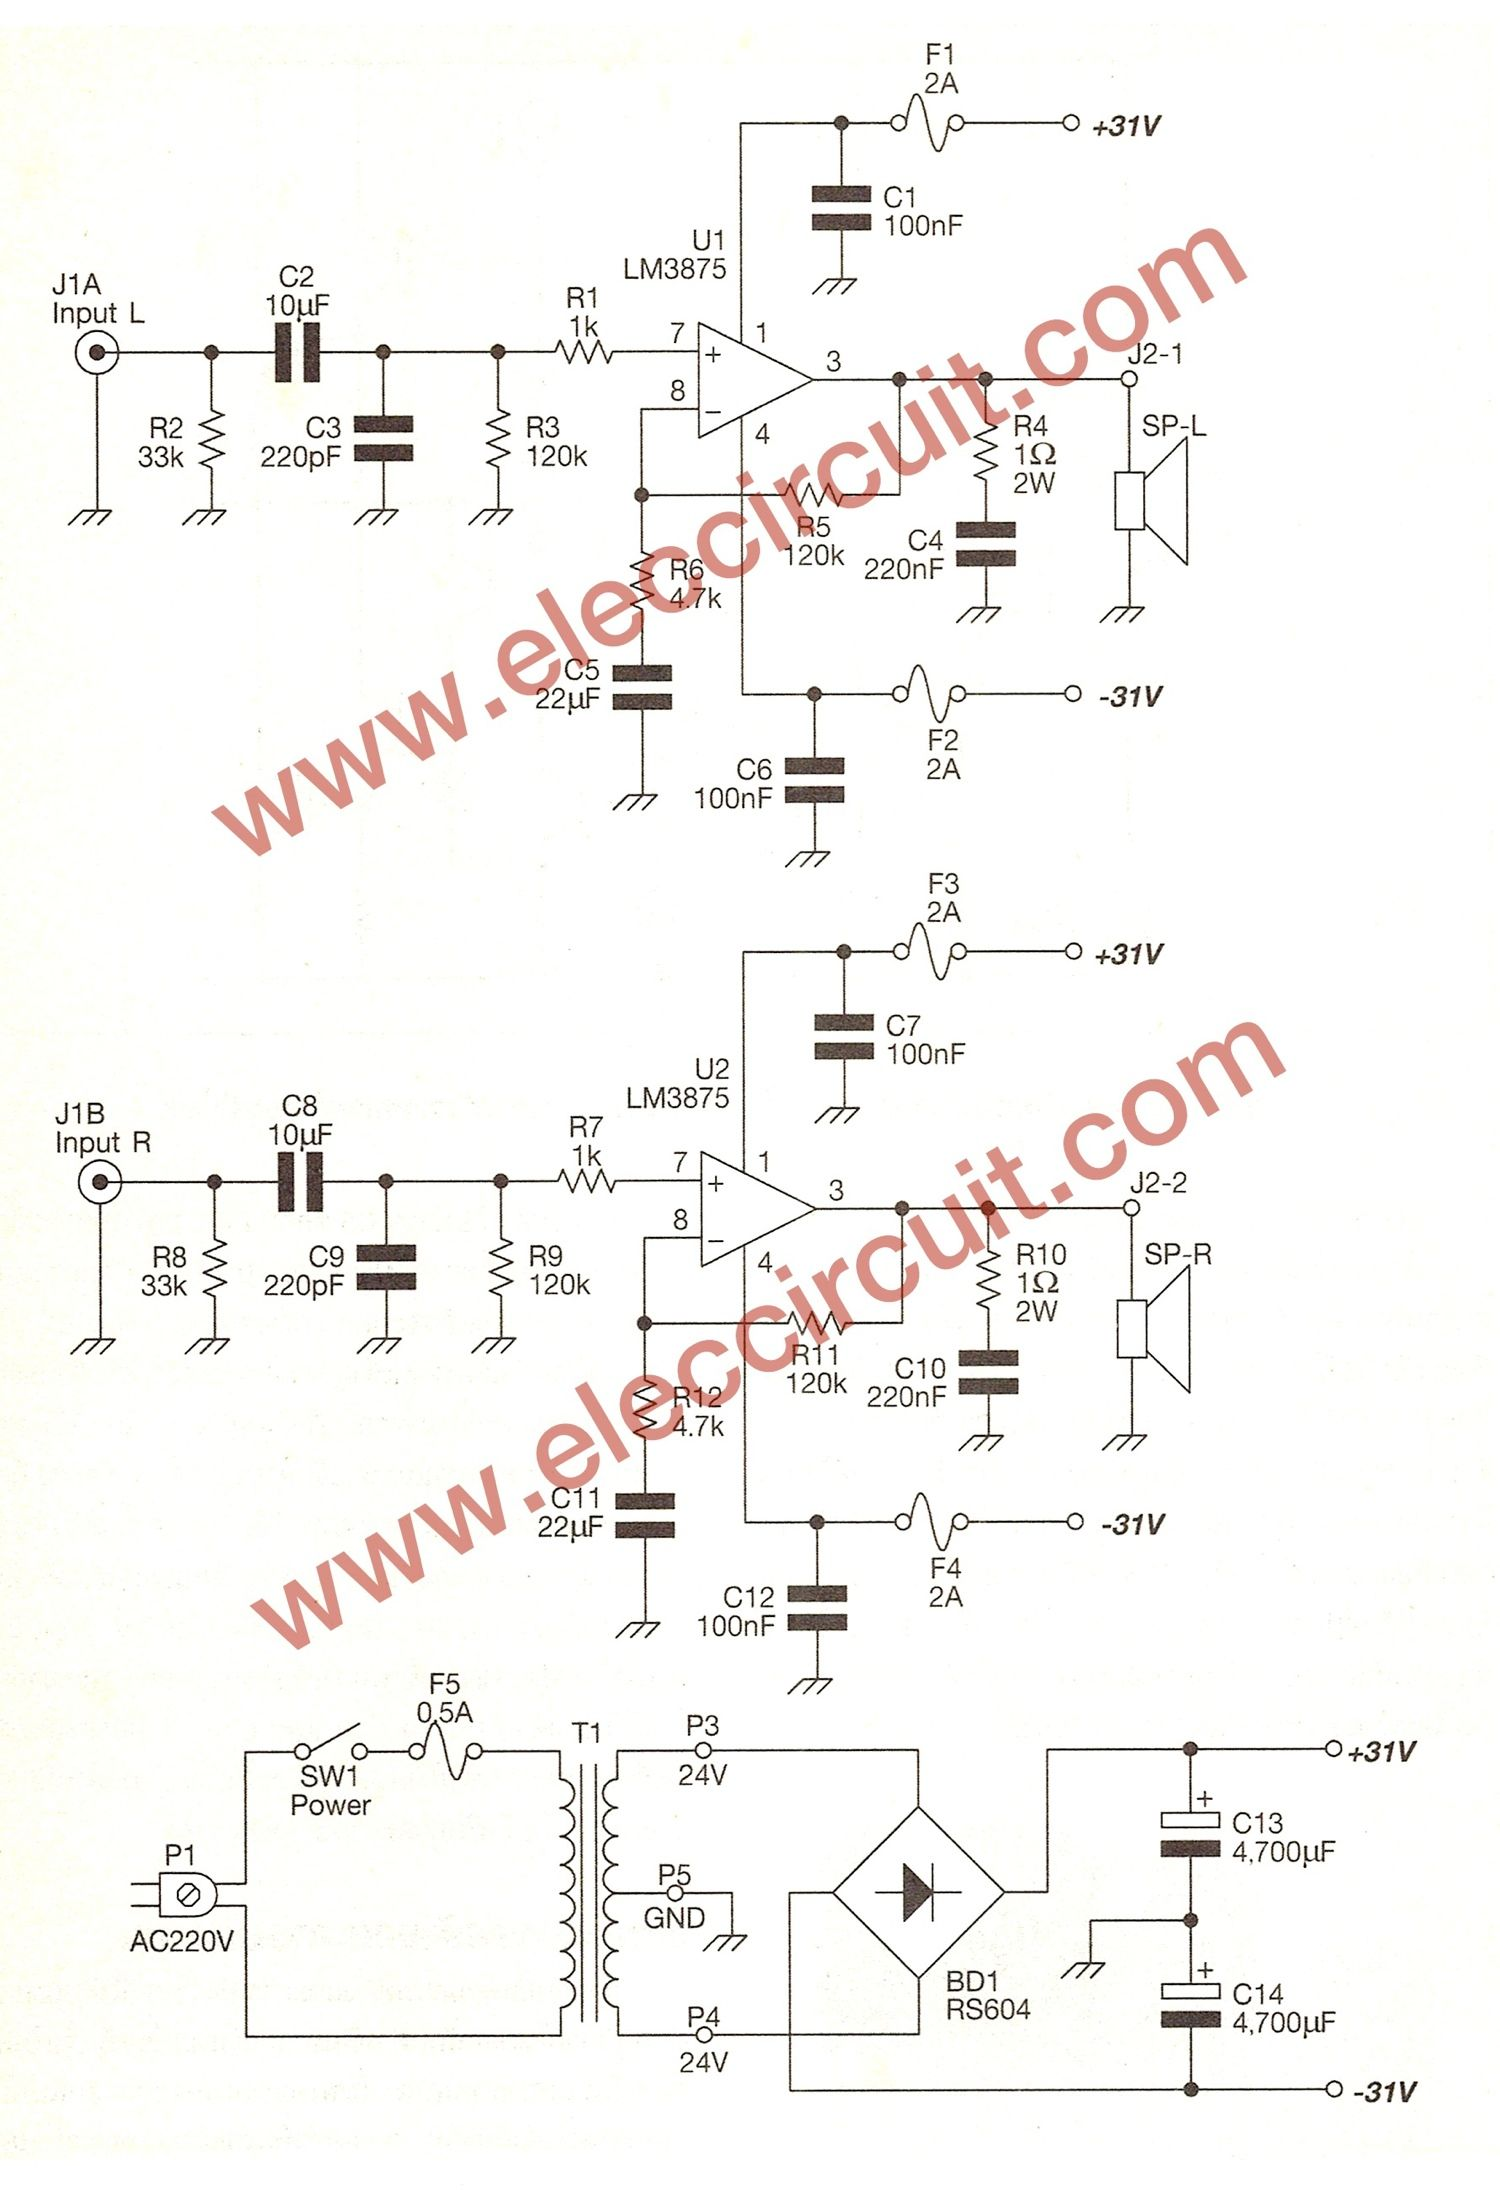 hight resolution of gainclone amplifier circuit stereo 40w using lm3875 eleccircuit amplifier tda2030tda2030 circuitcircuit diagram 14w hifi audio